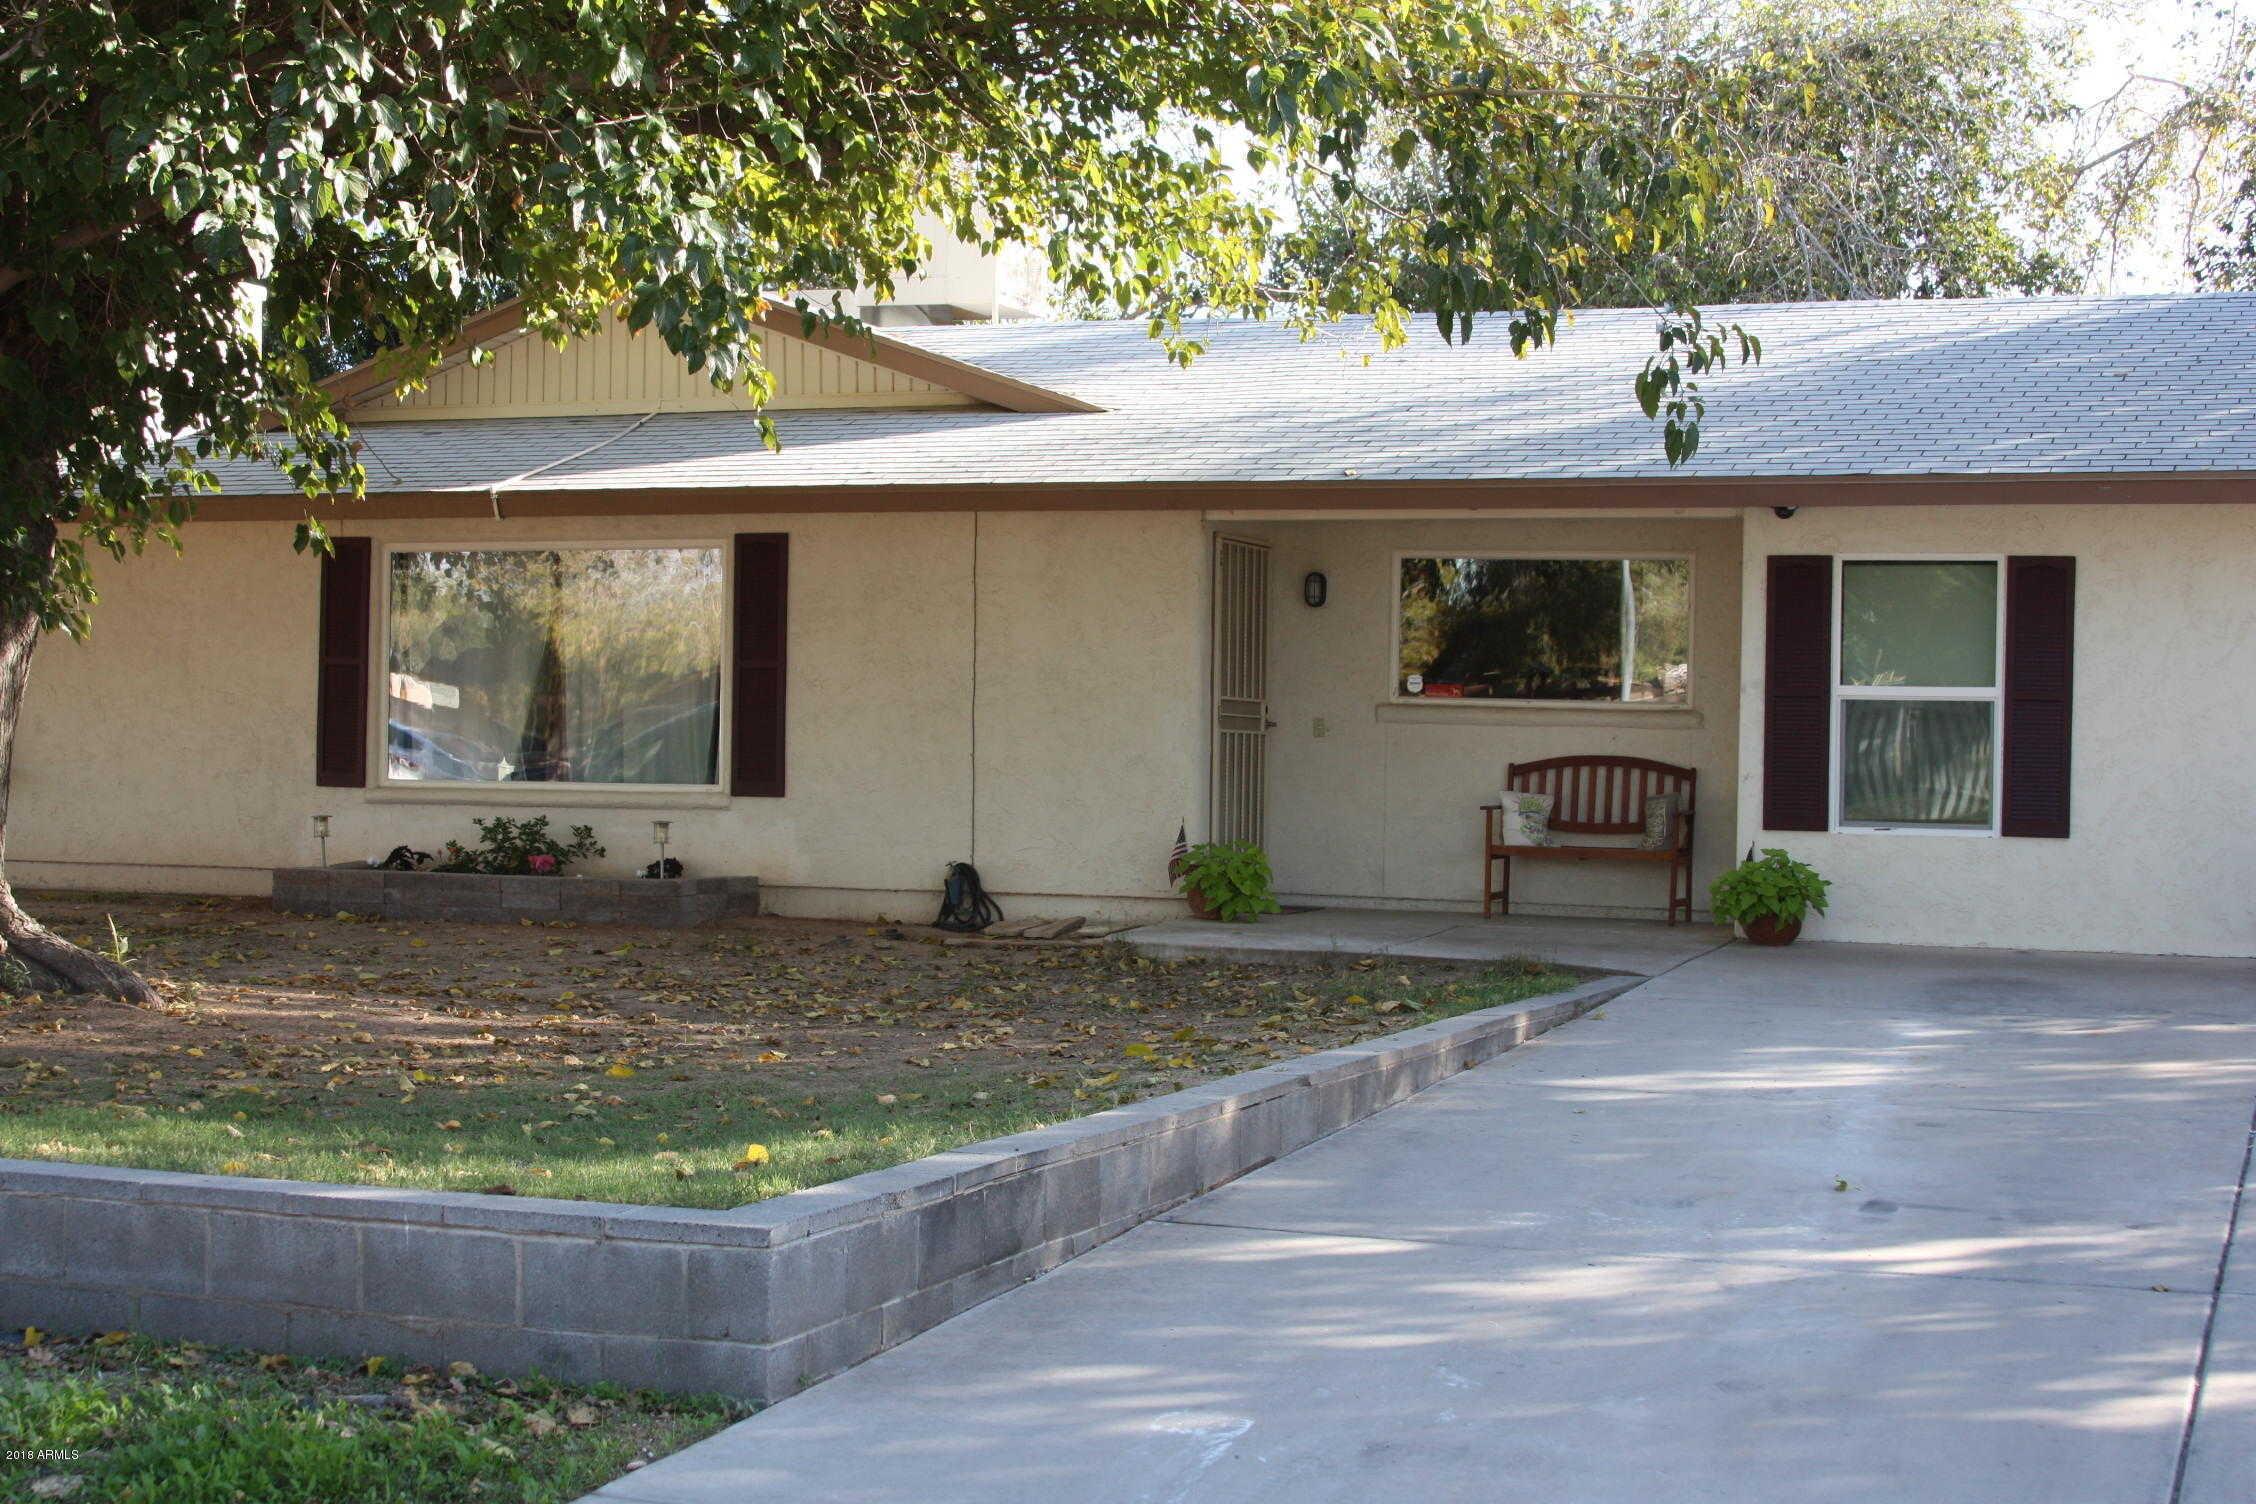 $380,000 - 3Br/2Ba - Home for Sale in Sunburst Farms 21, Glendale